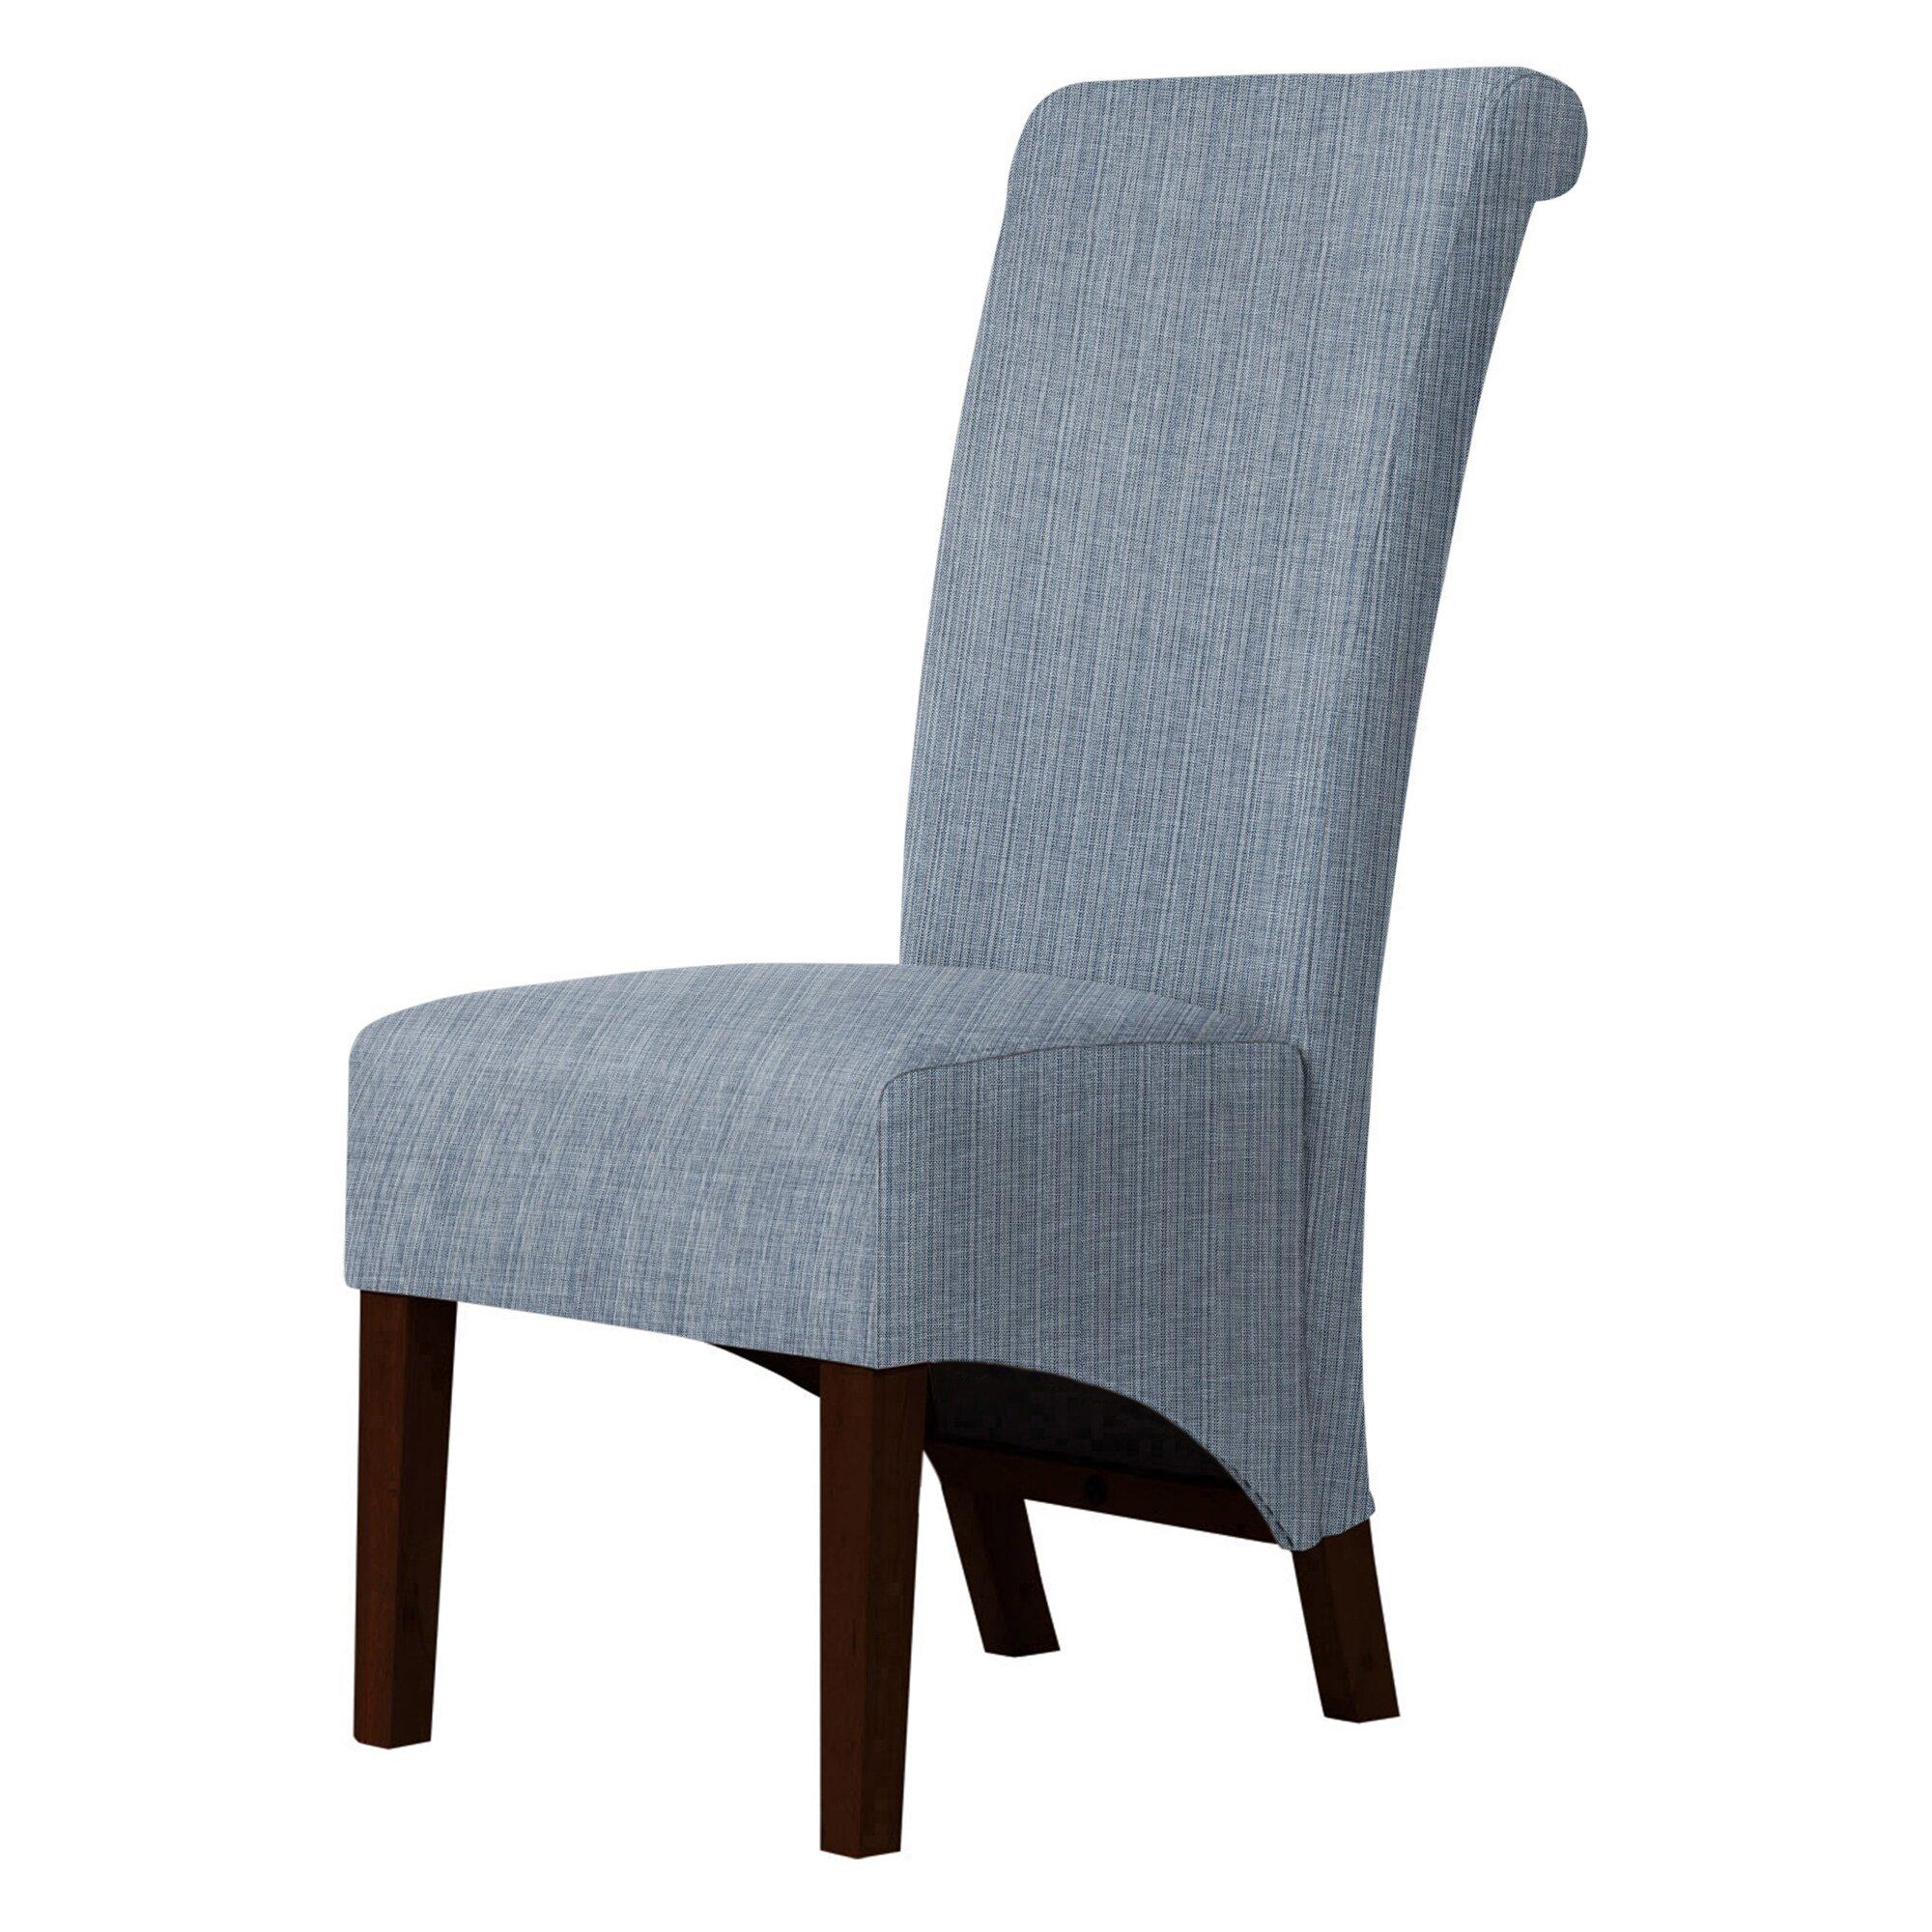 Red barrel studio keyesport upholstered dining chair for Red upholstered dining chair